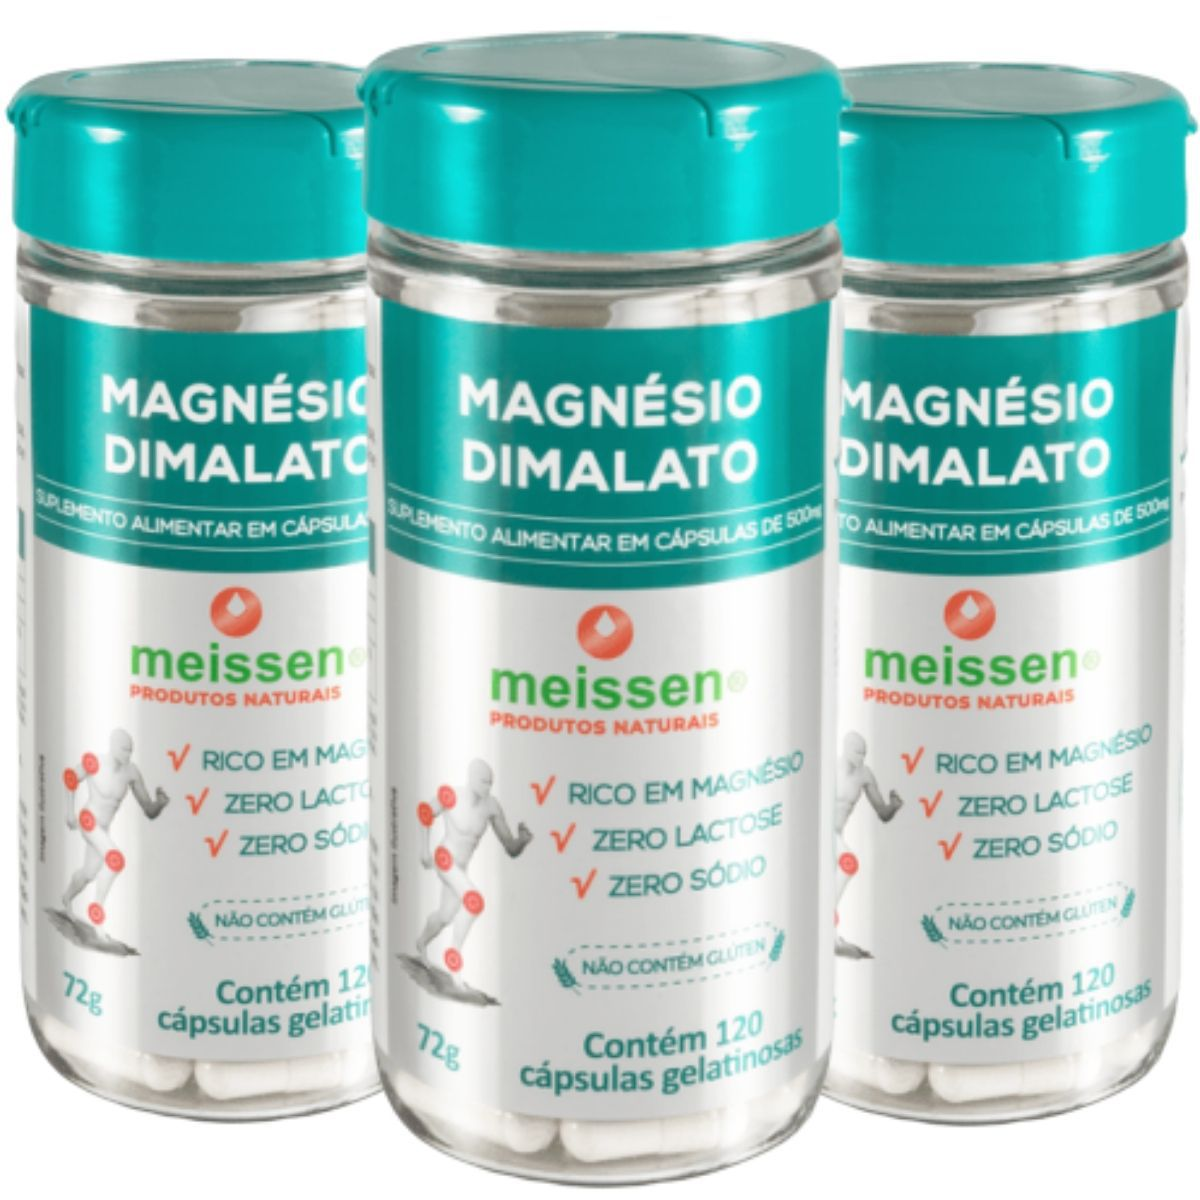 3x  Magnesio Dimalato - 360 Capsulas - 2 x Dia - Meissen